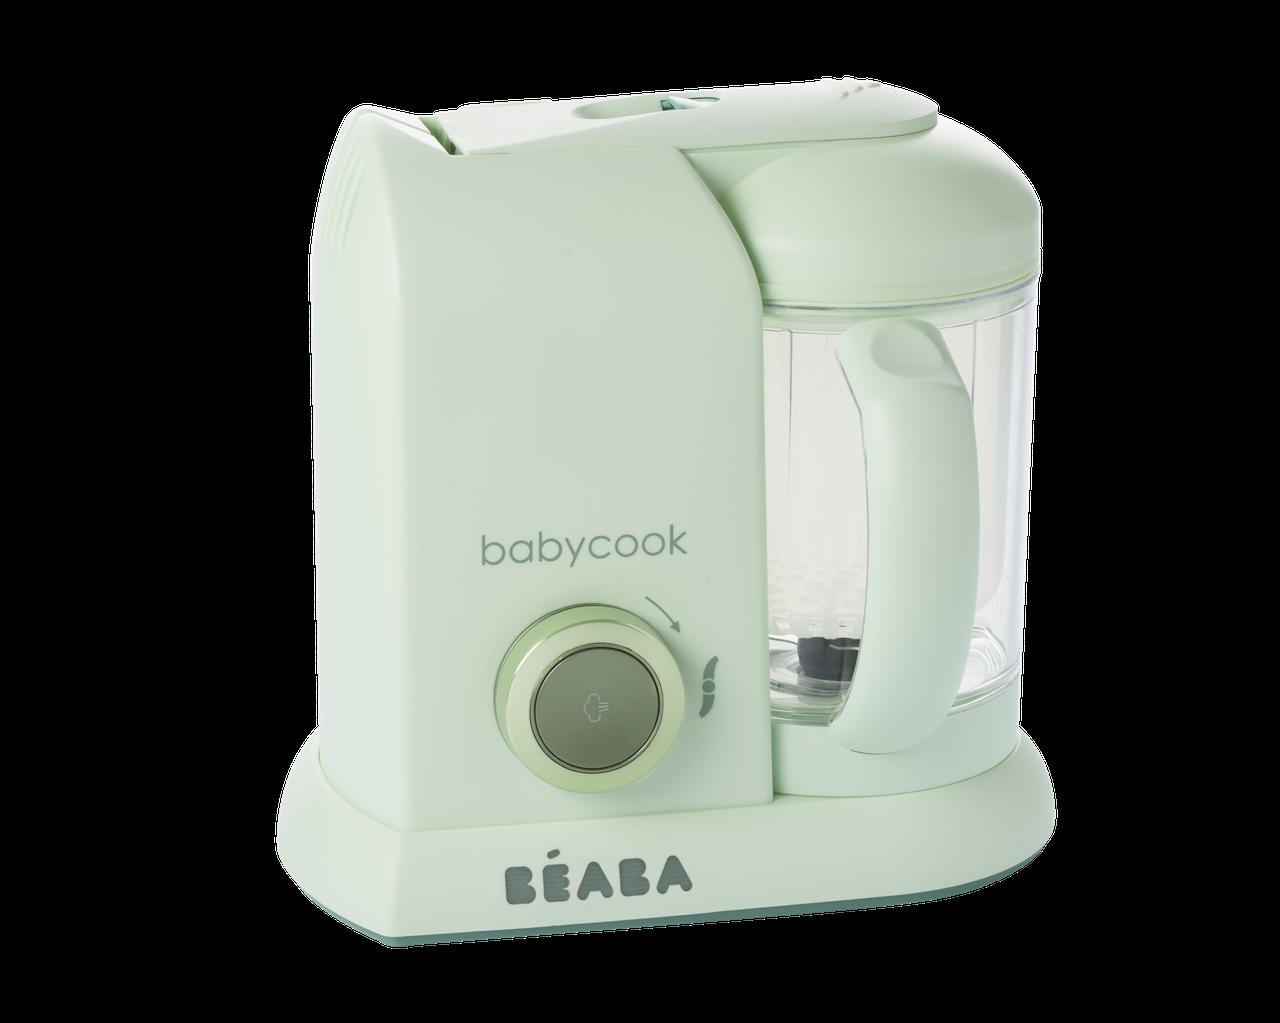 Пароварка-блендер Beaba Babycook Limited Edition mint, арт. 912607